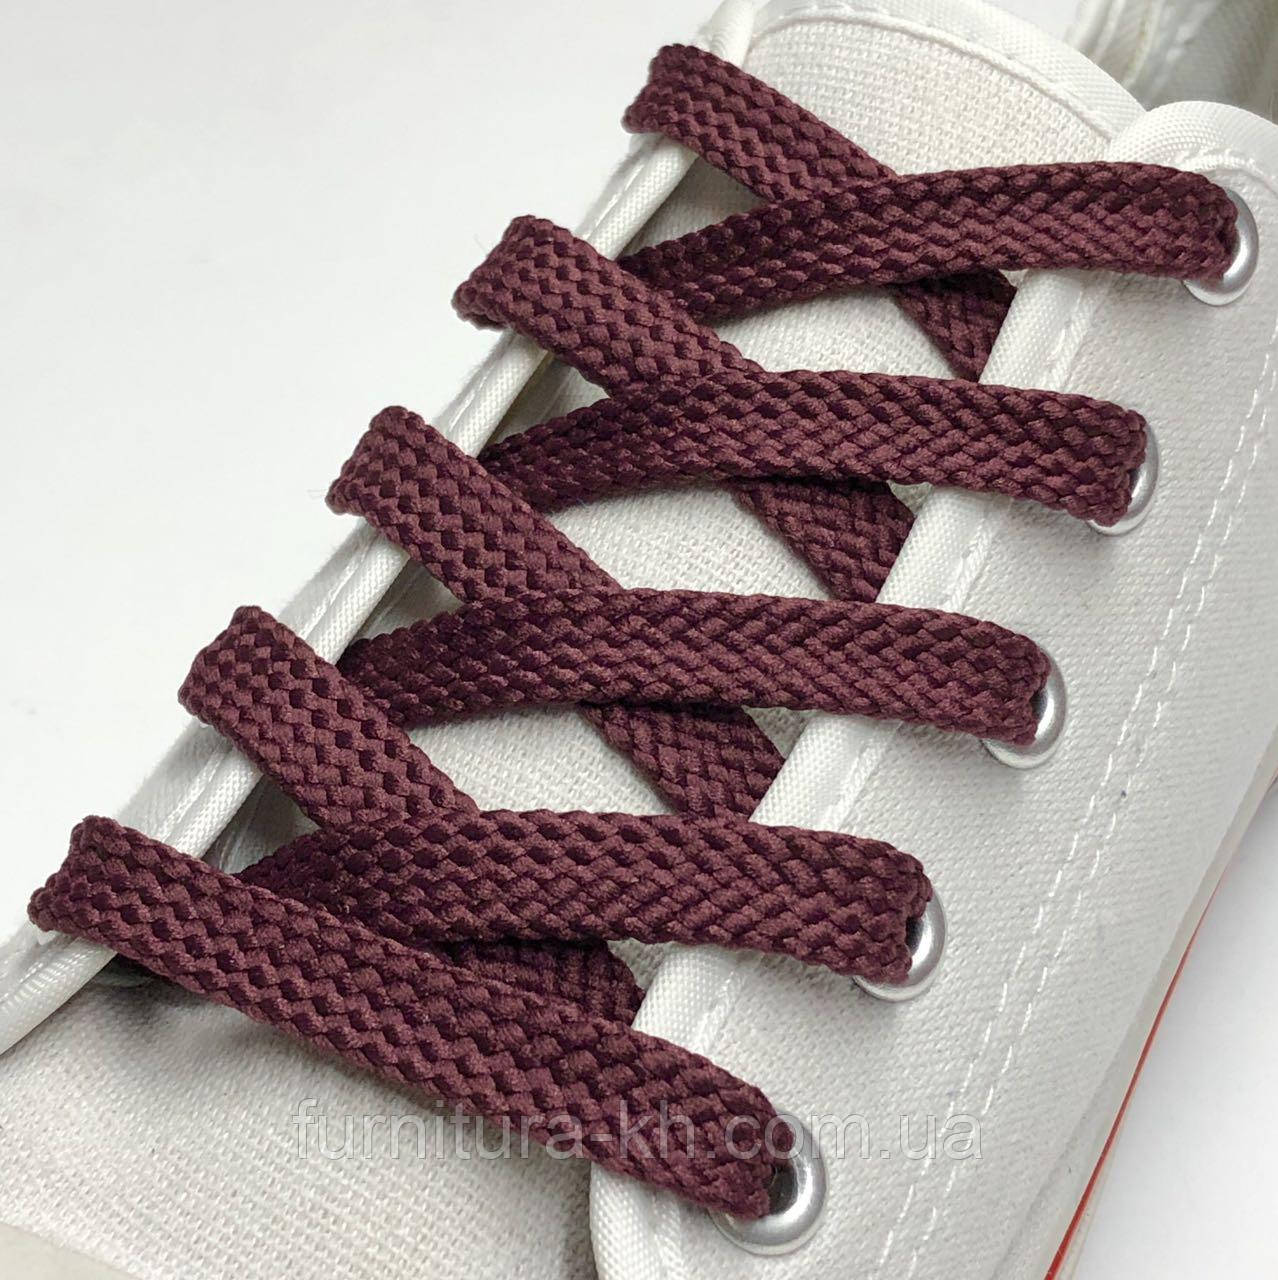 Шнурок Простой Плоский Длинна 1 метр  цвет Бордо (ширина 7 мм)